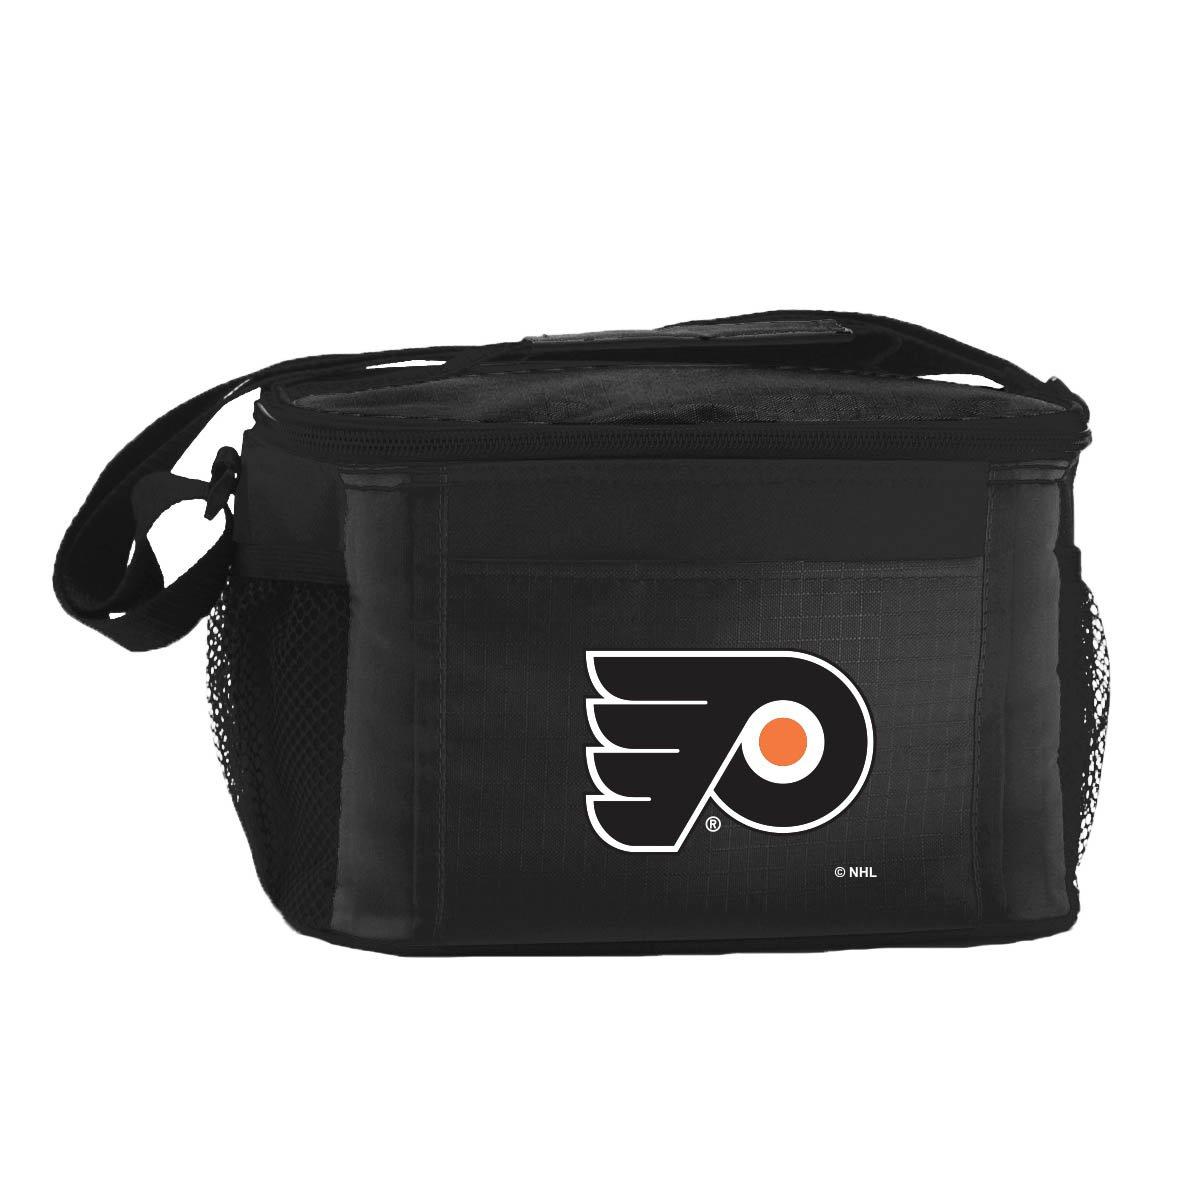 NHL Philadelphia Flyers Team Logo 6 Can Cooler Bag or Lunch Box - Black